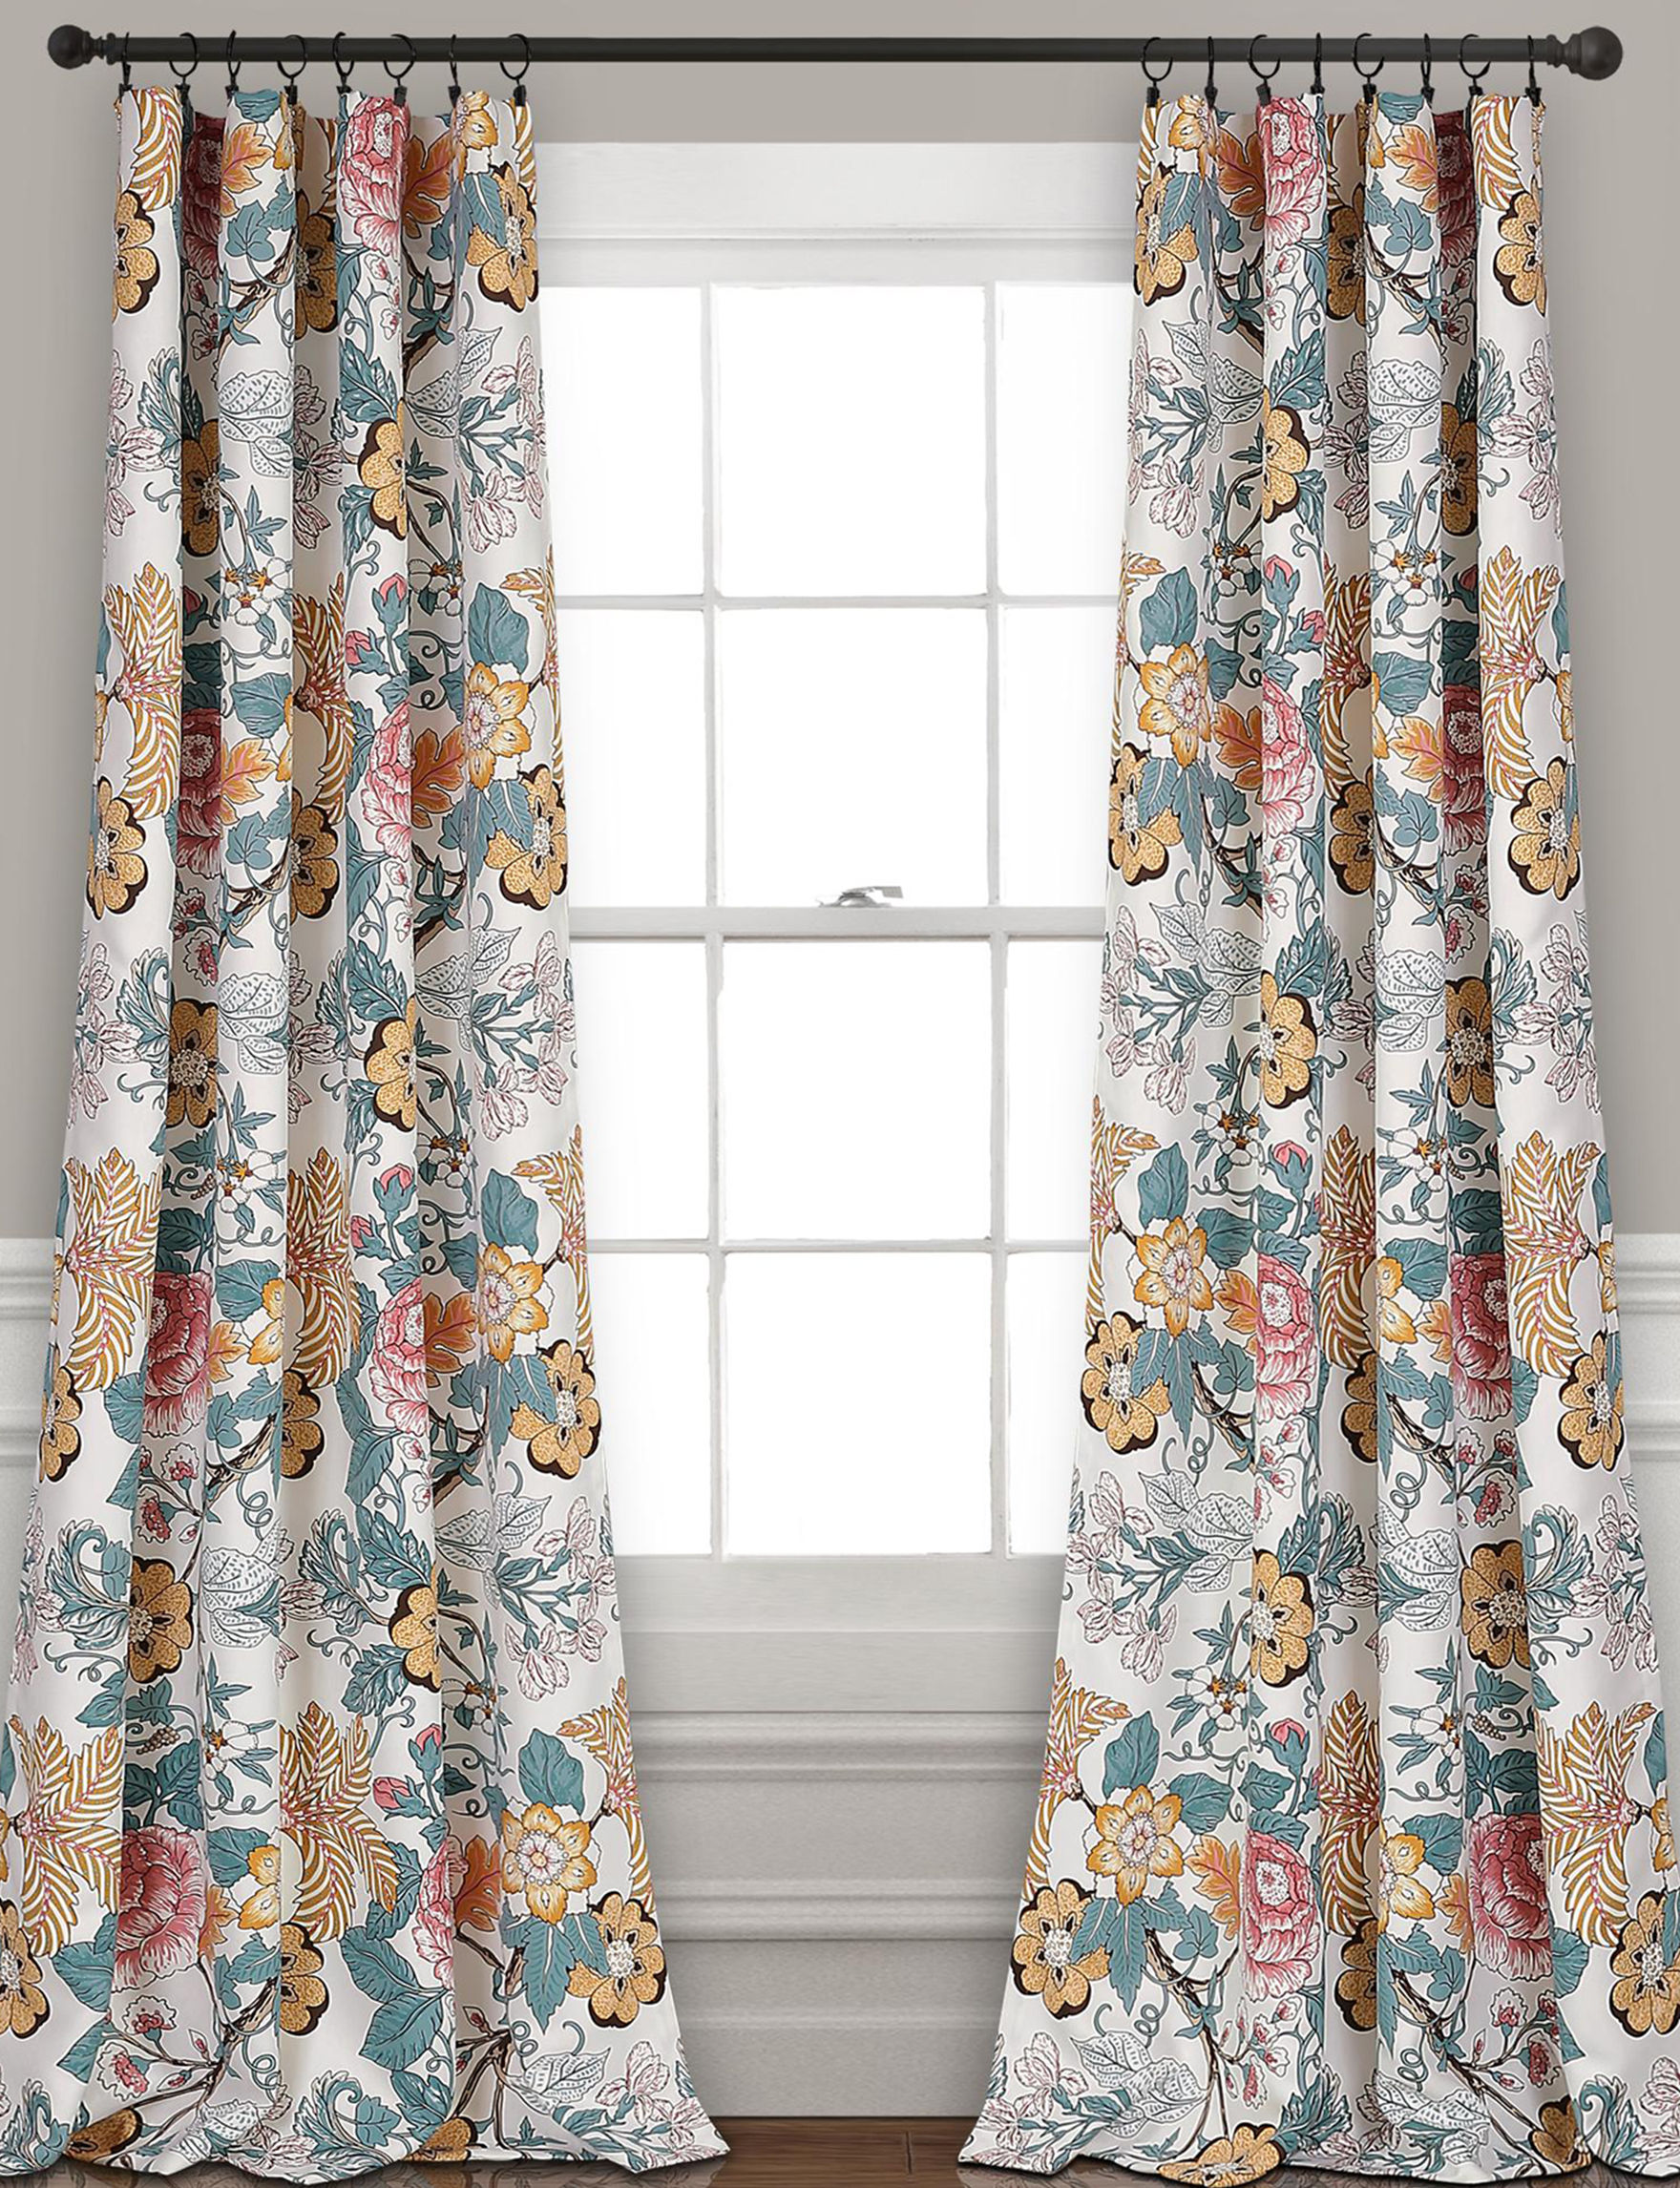 Lush Decor Yellow Floral Curtains & Drapes Window Treatments